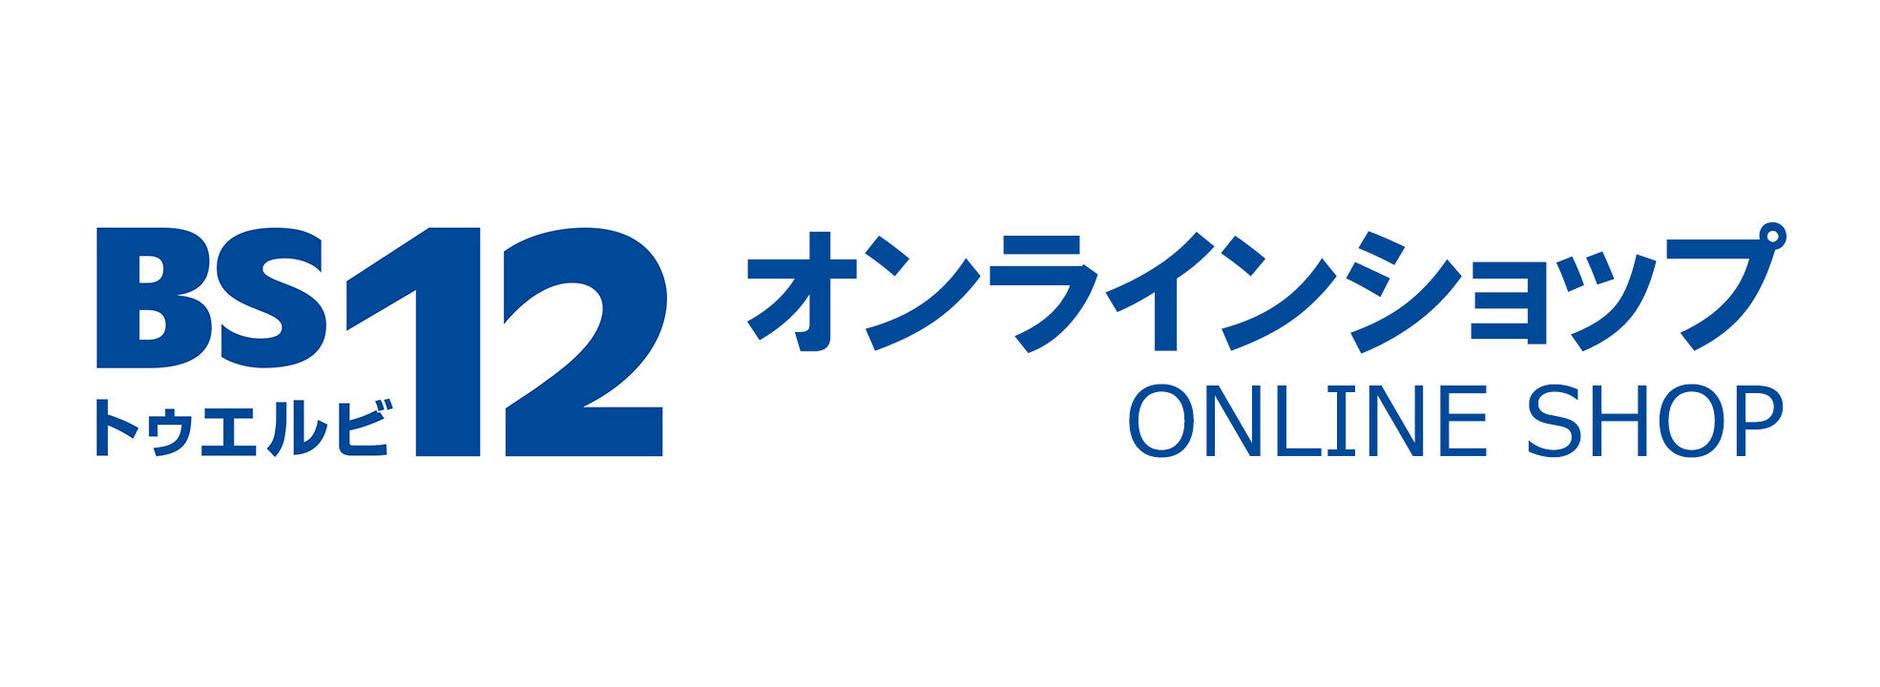 BS12 トゥエルビ オンラインショップ